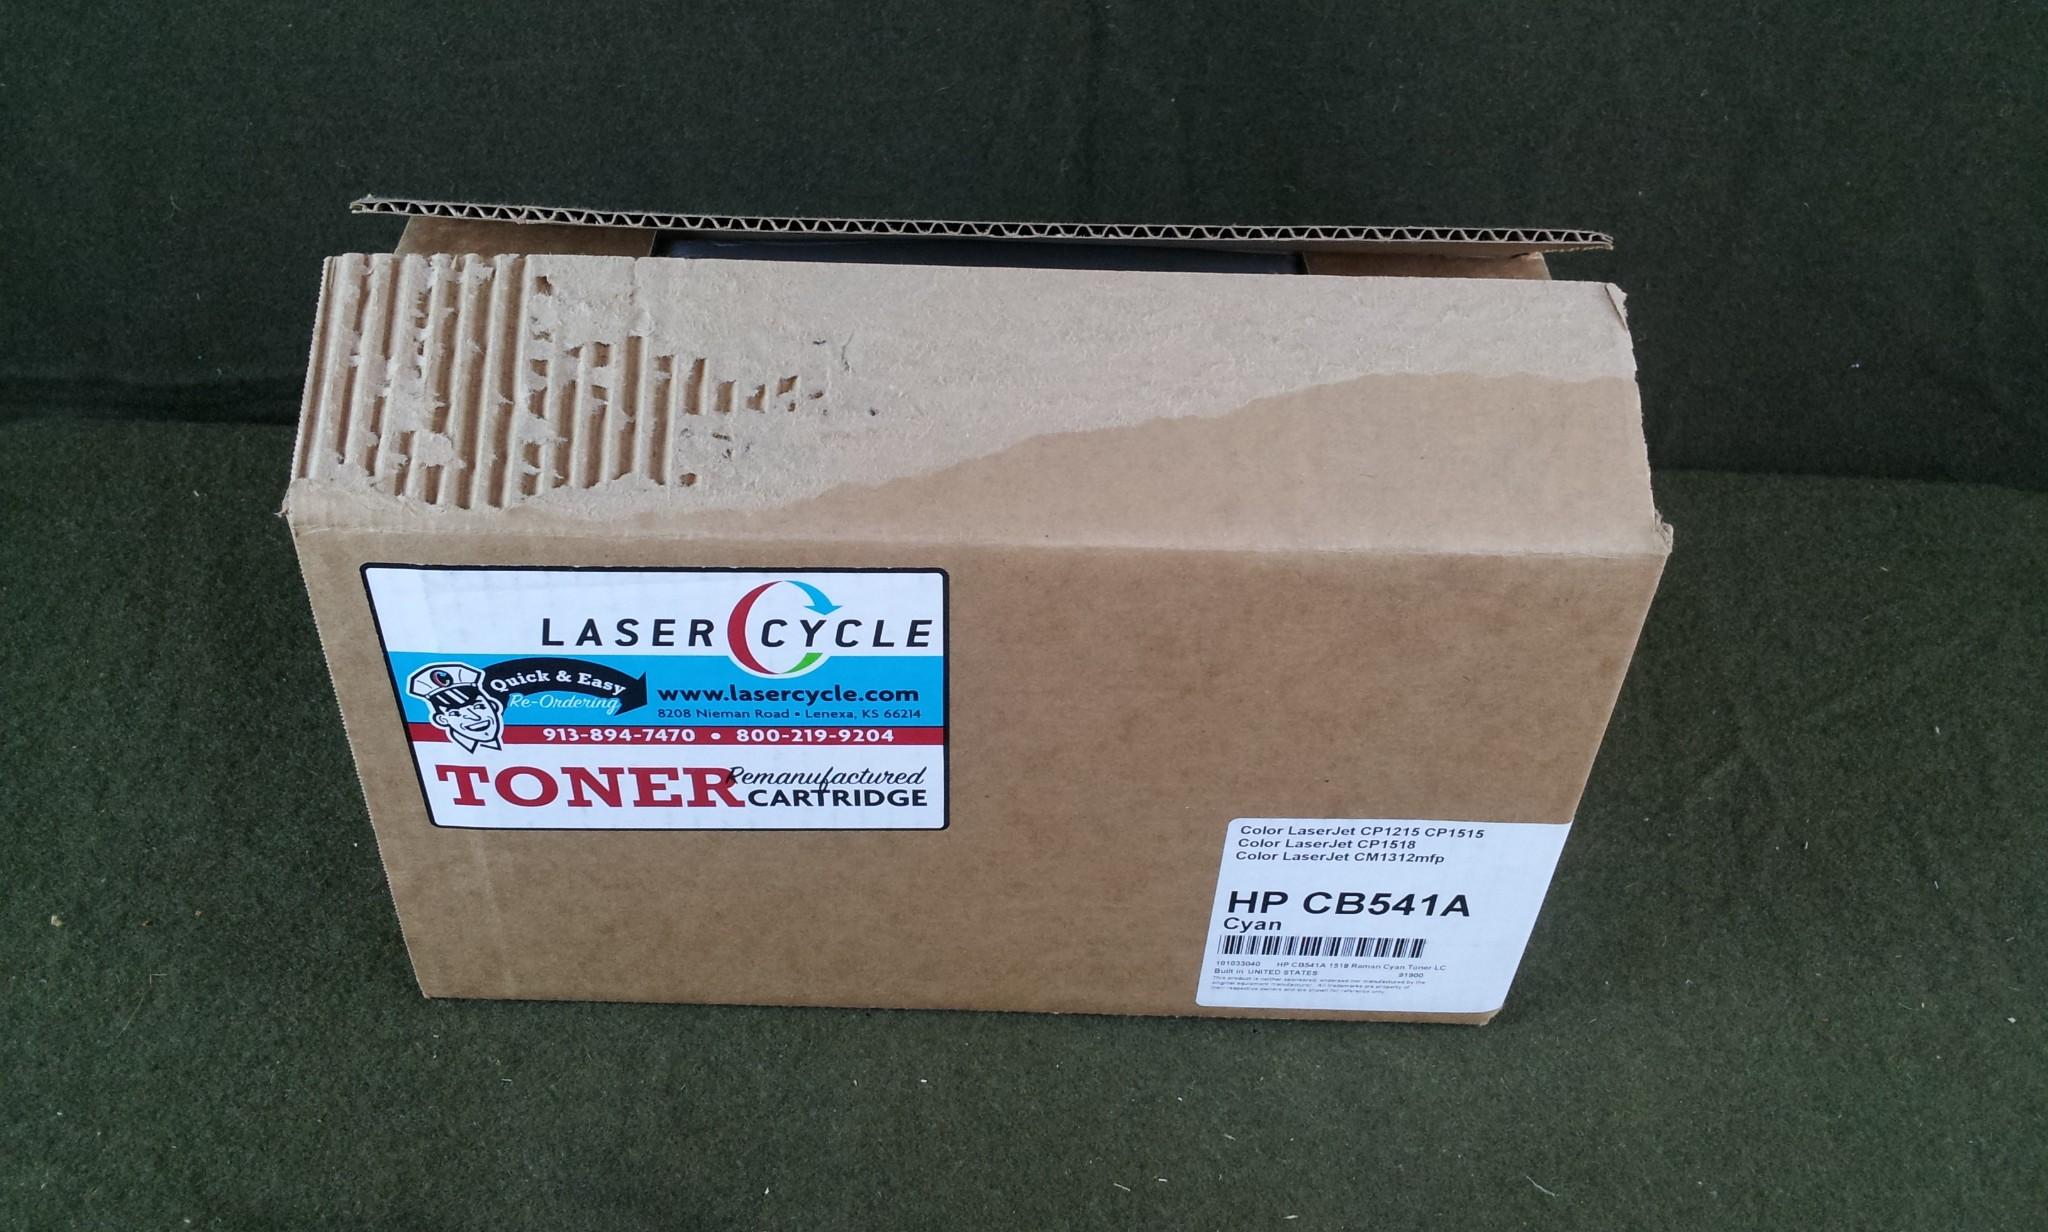 Laser Cycle Hp CB541A Cyan Toner Cartridge NEW